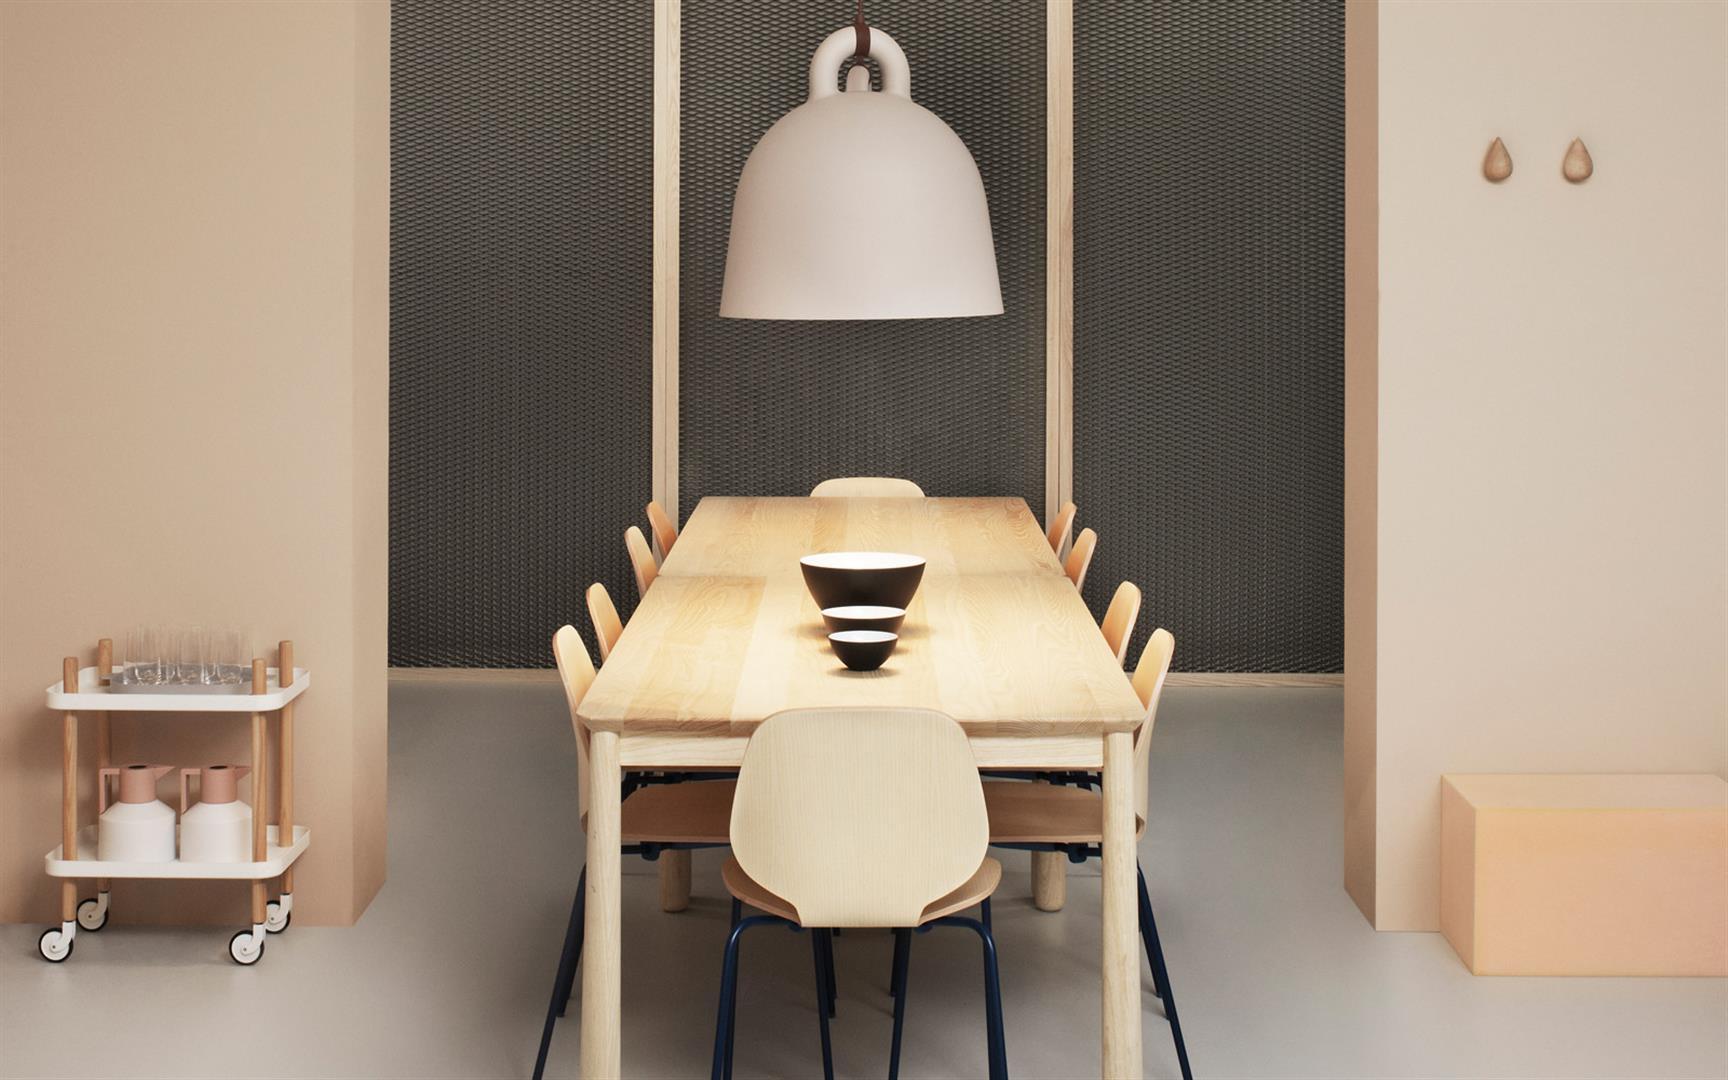 lampe bell white l von normann copenhagen. Black Bedroom Furniture Sets. Home Design Ideas